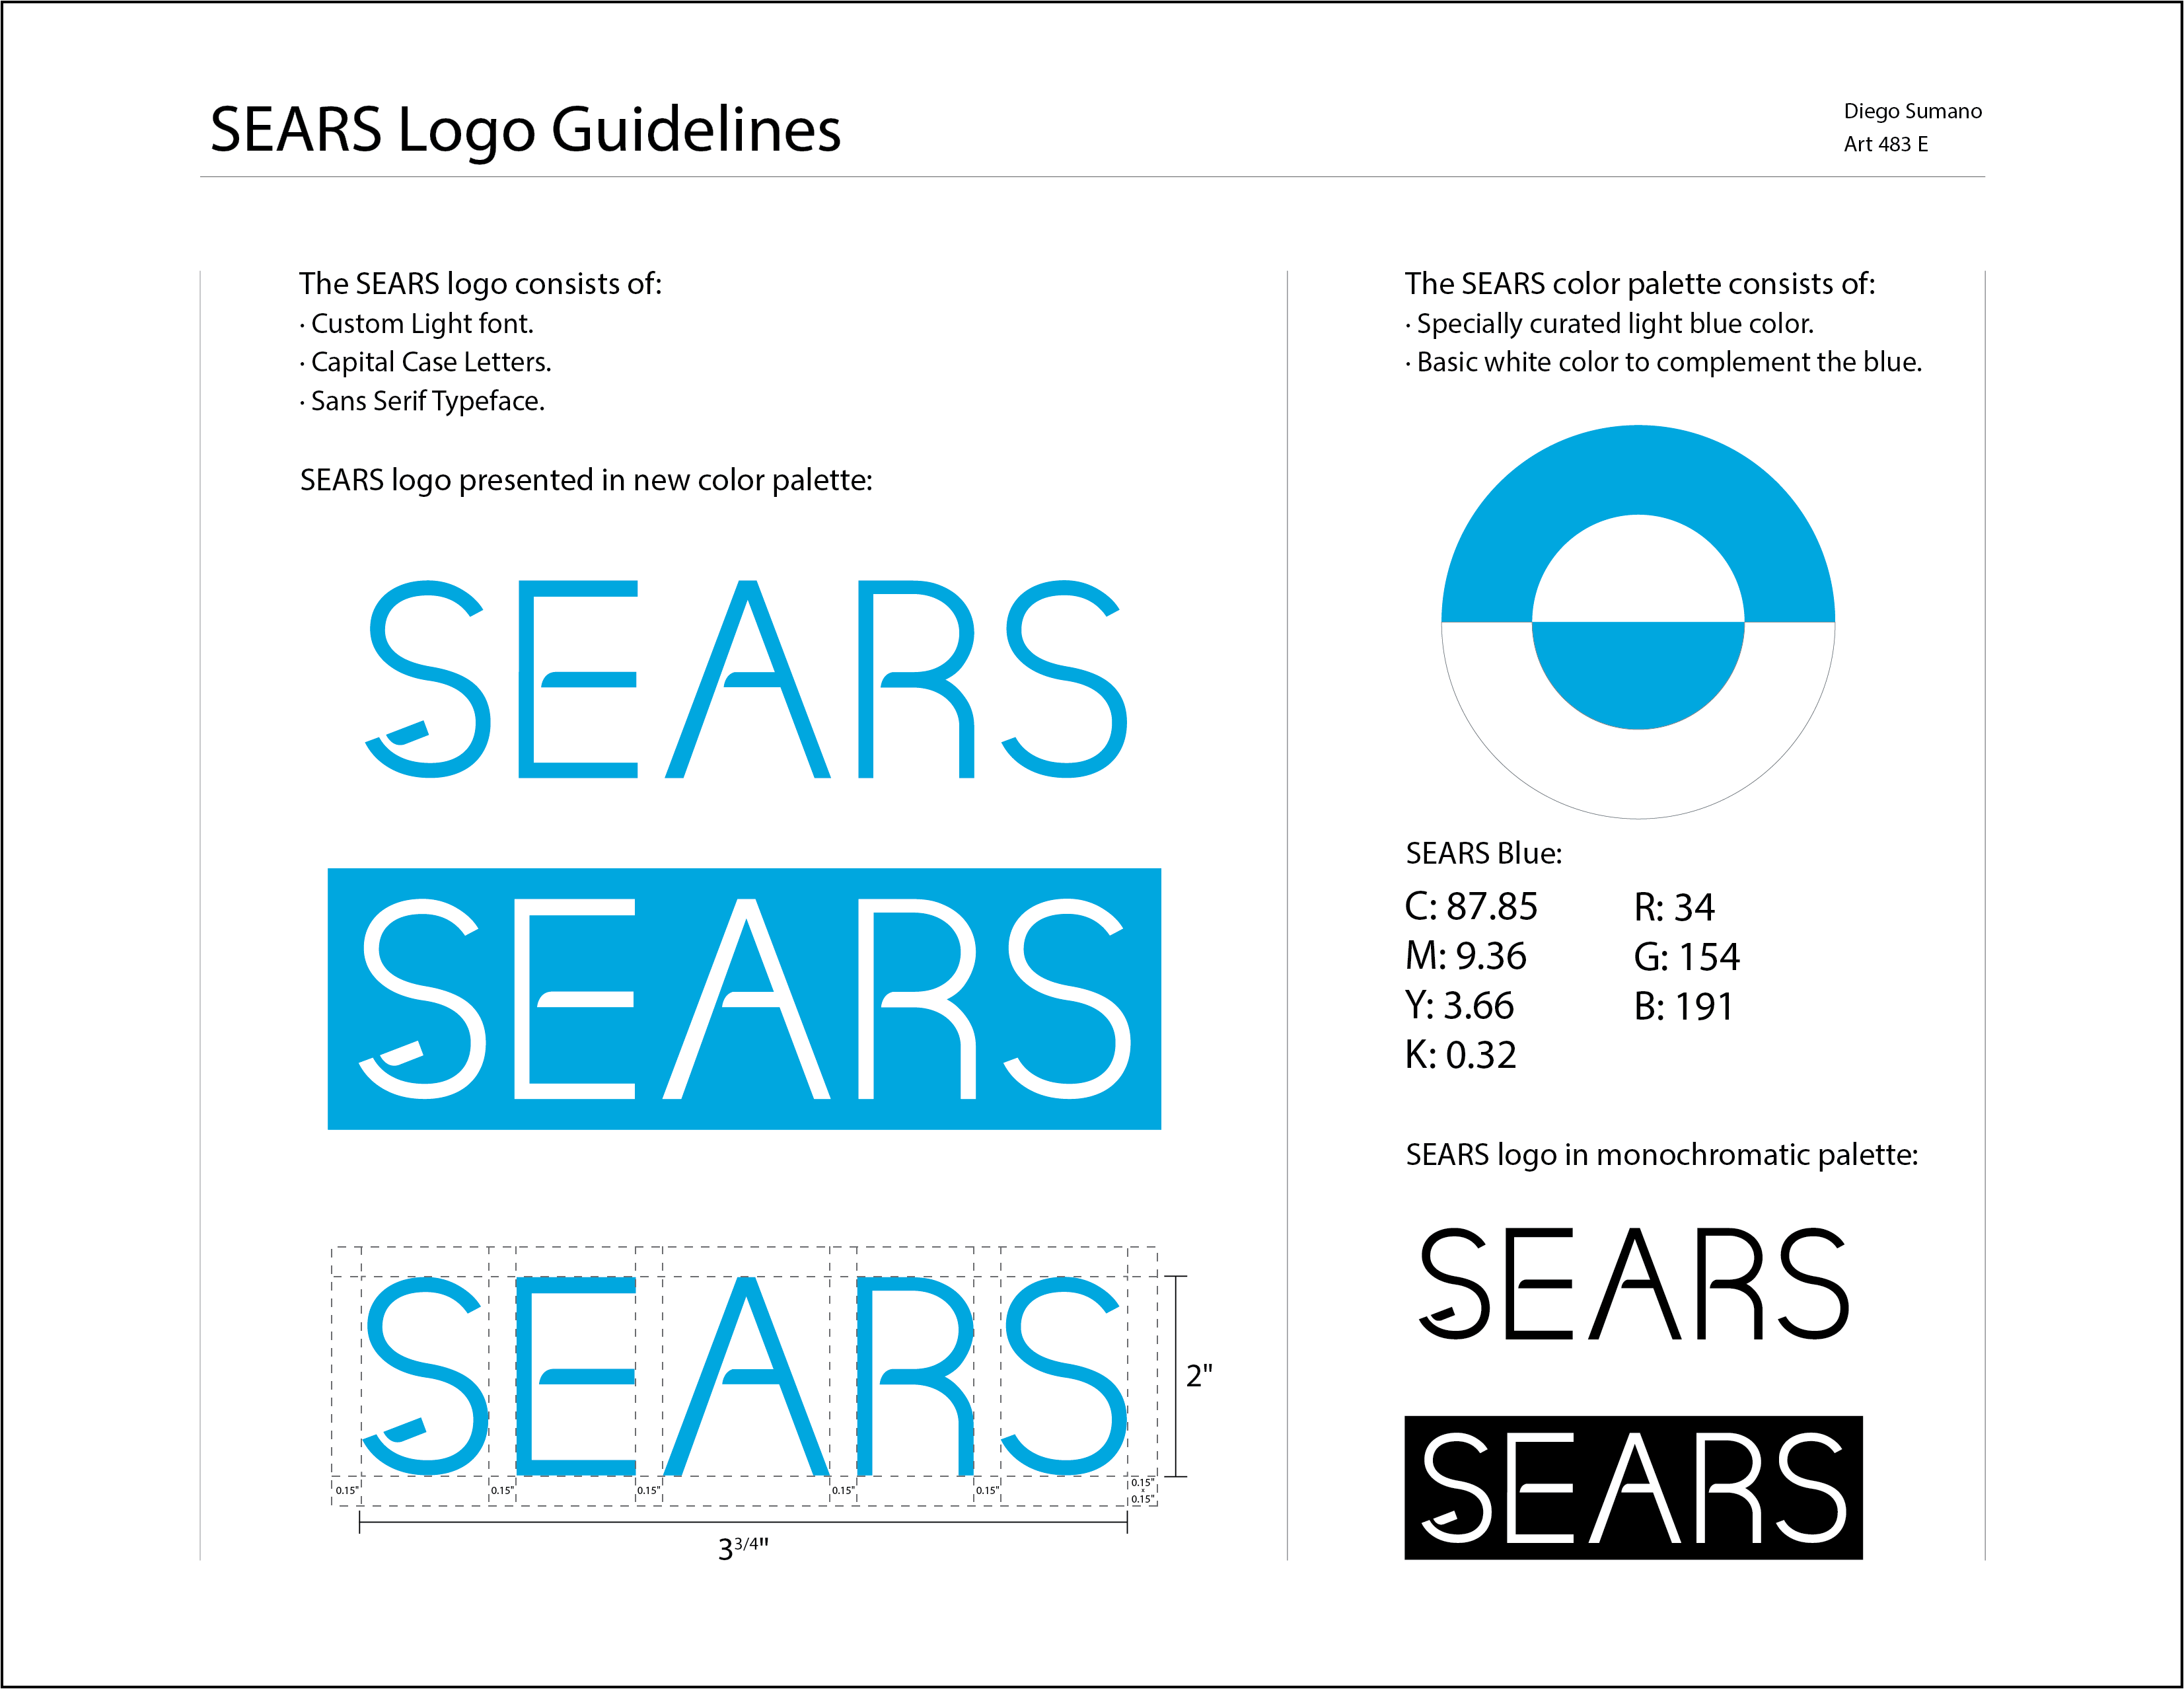 Sears Logo Style Guide Light Font Color Complement Light Blue Color